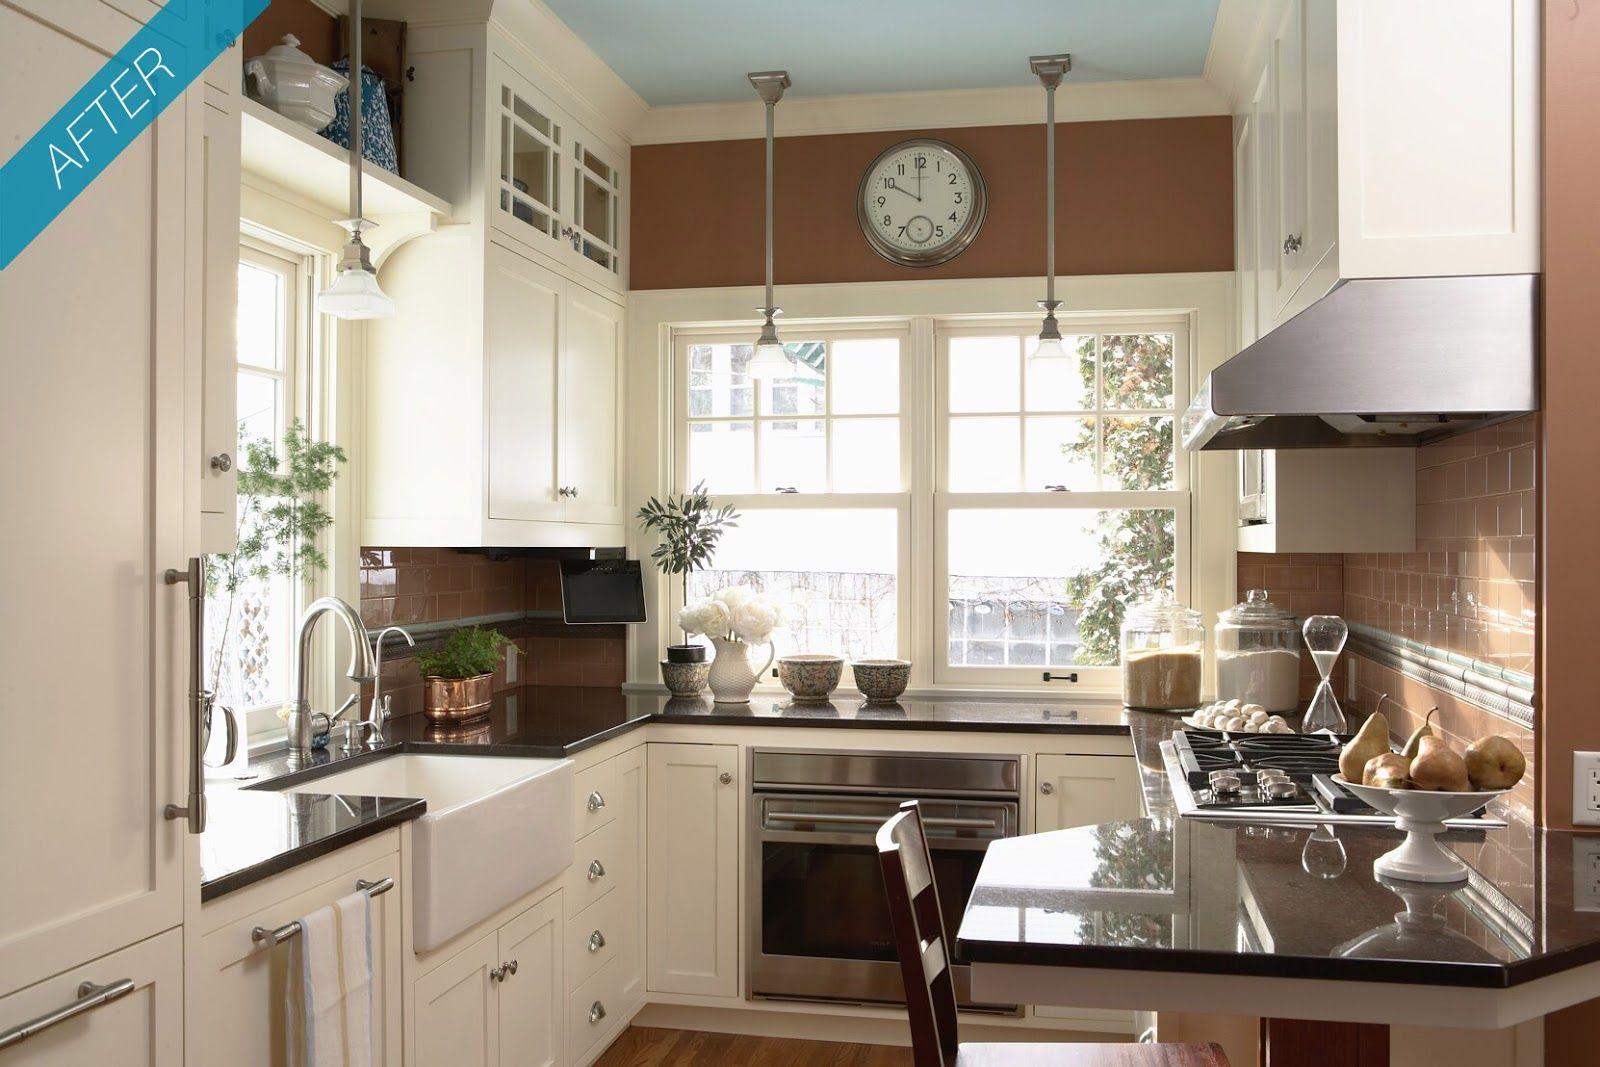 Home Decor Pictures Kitchen | Small kitchen layouts, Kitchen corner ...